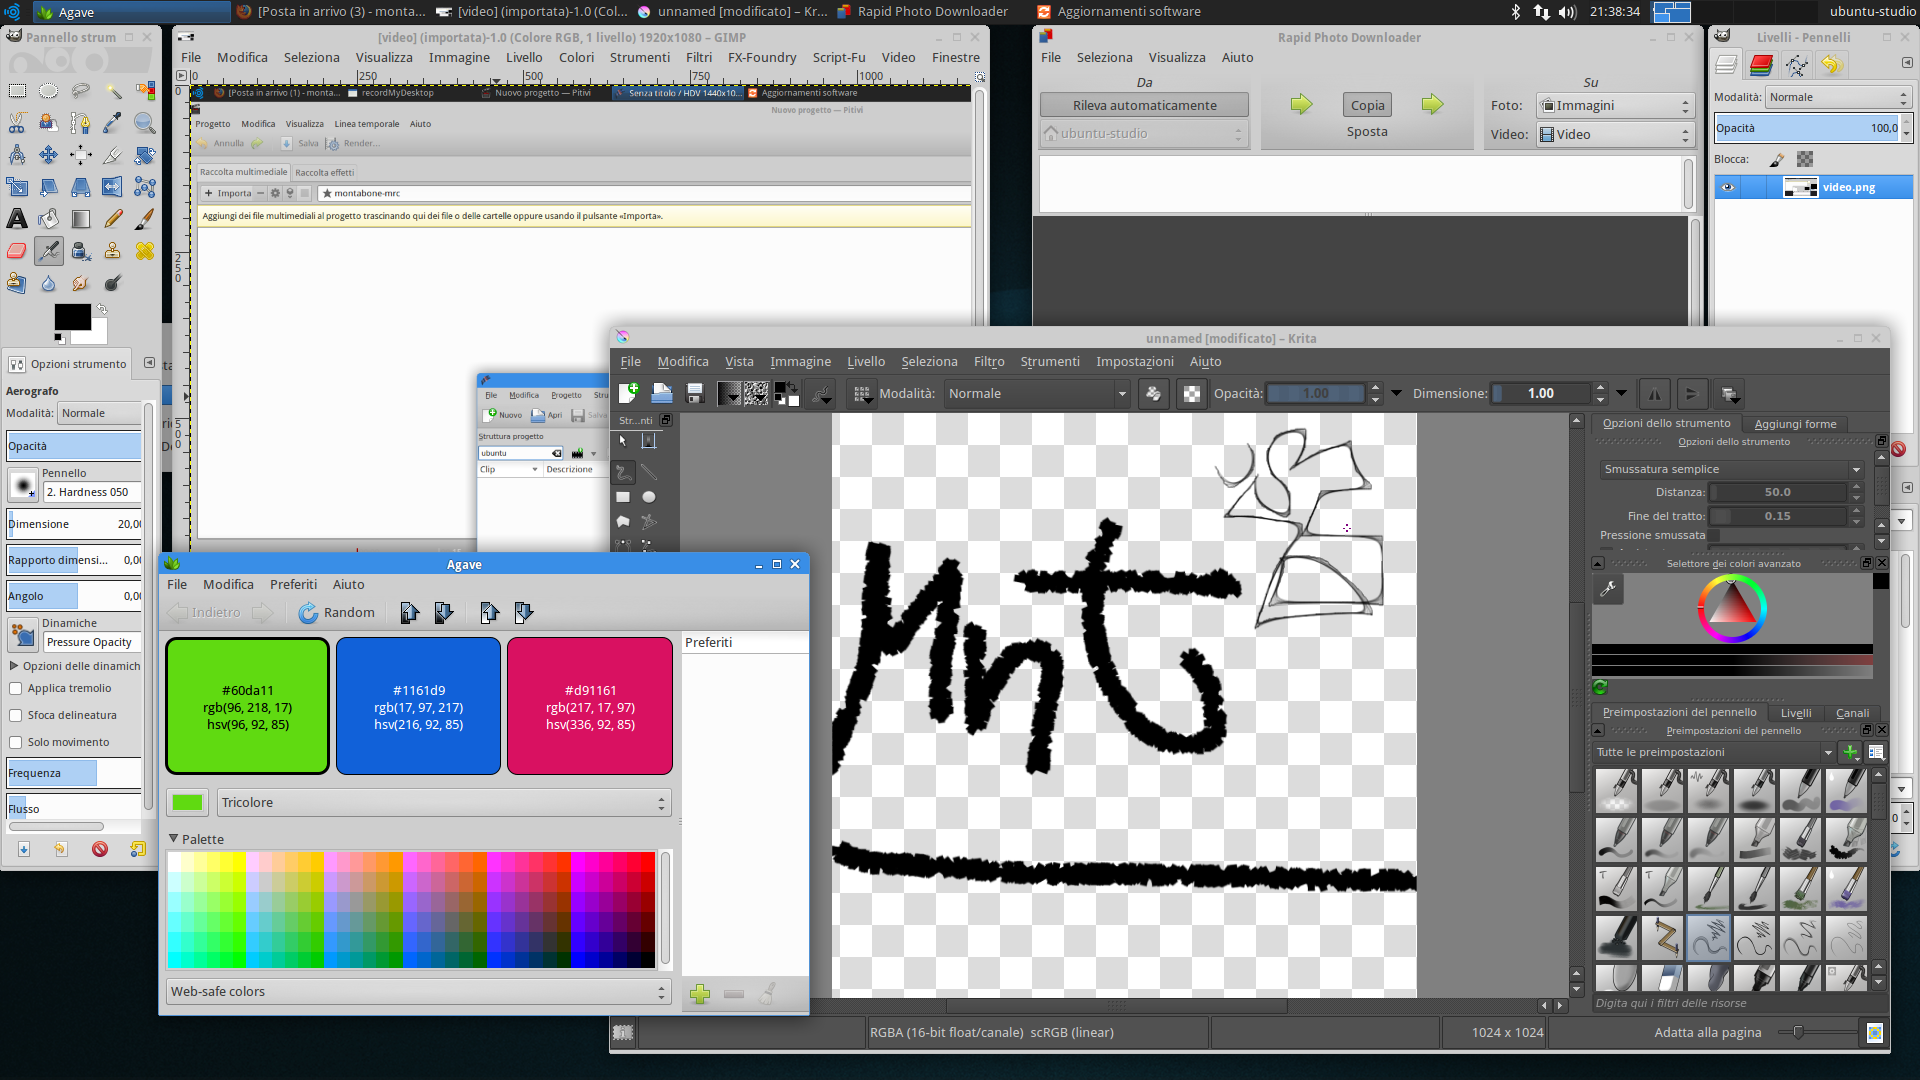 sites/default/files/scopri-ubuntu/ubuntustudio/grafica.png